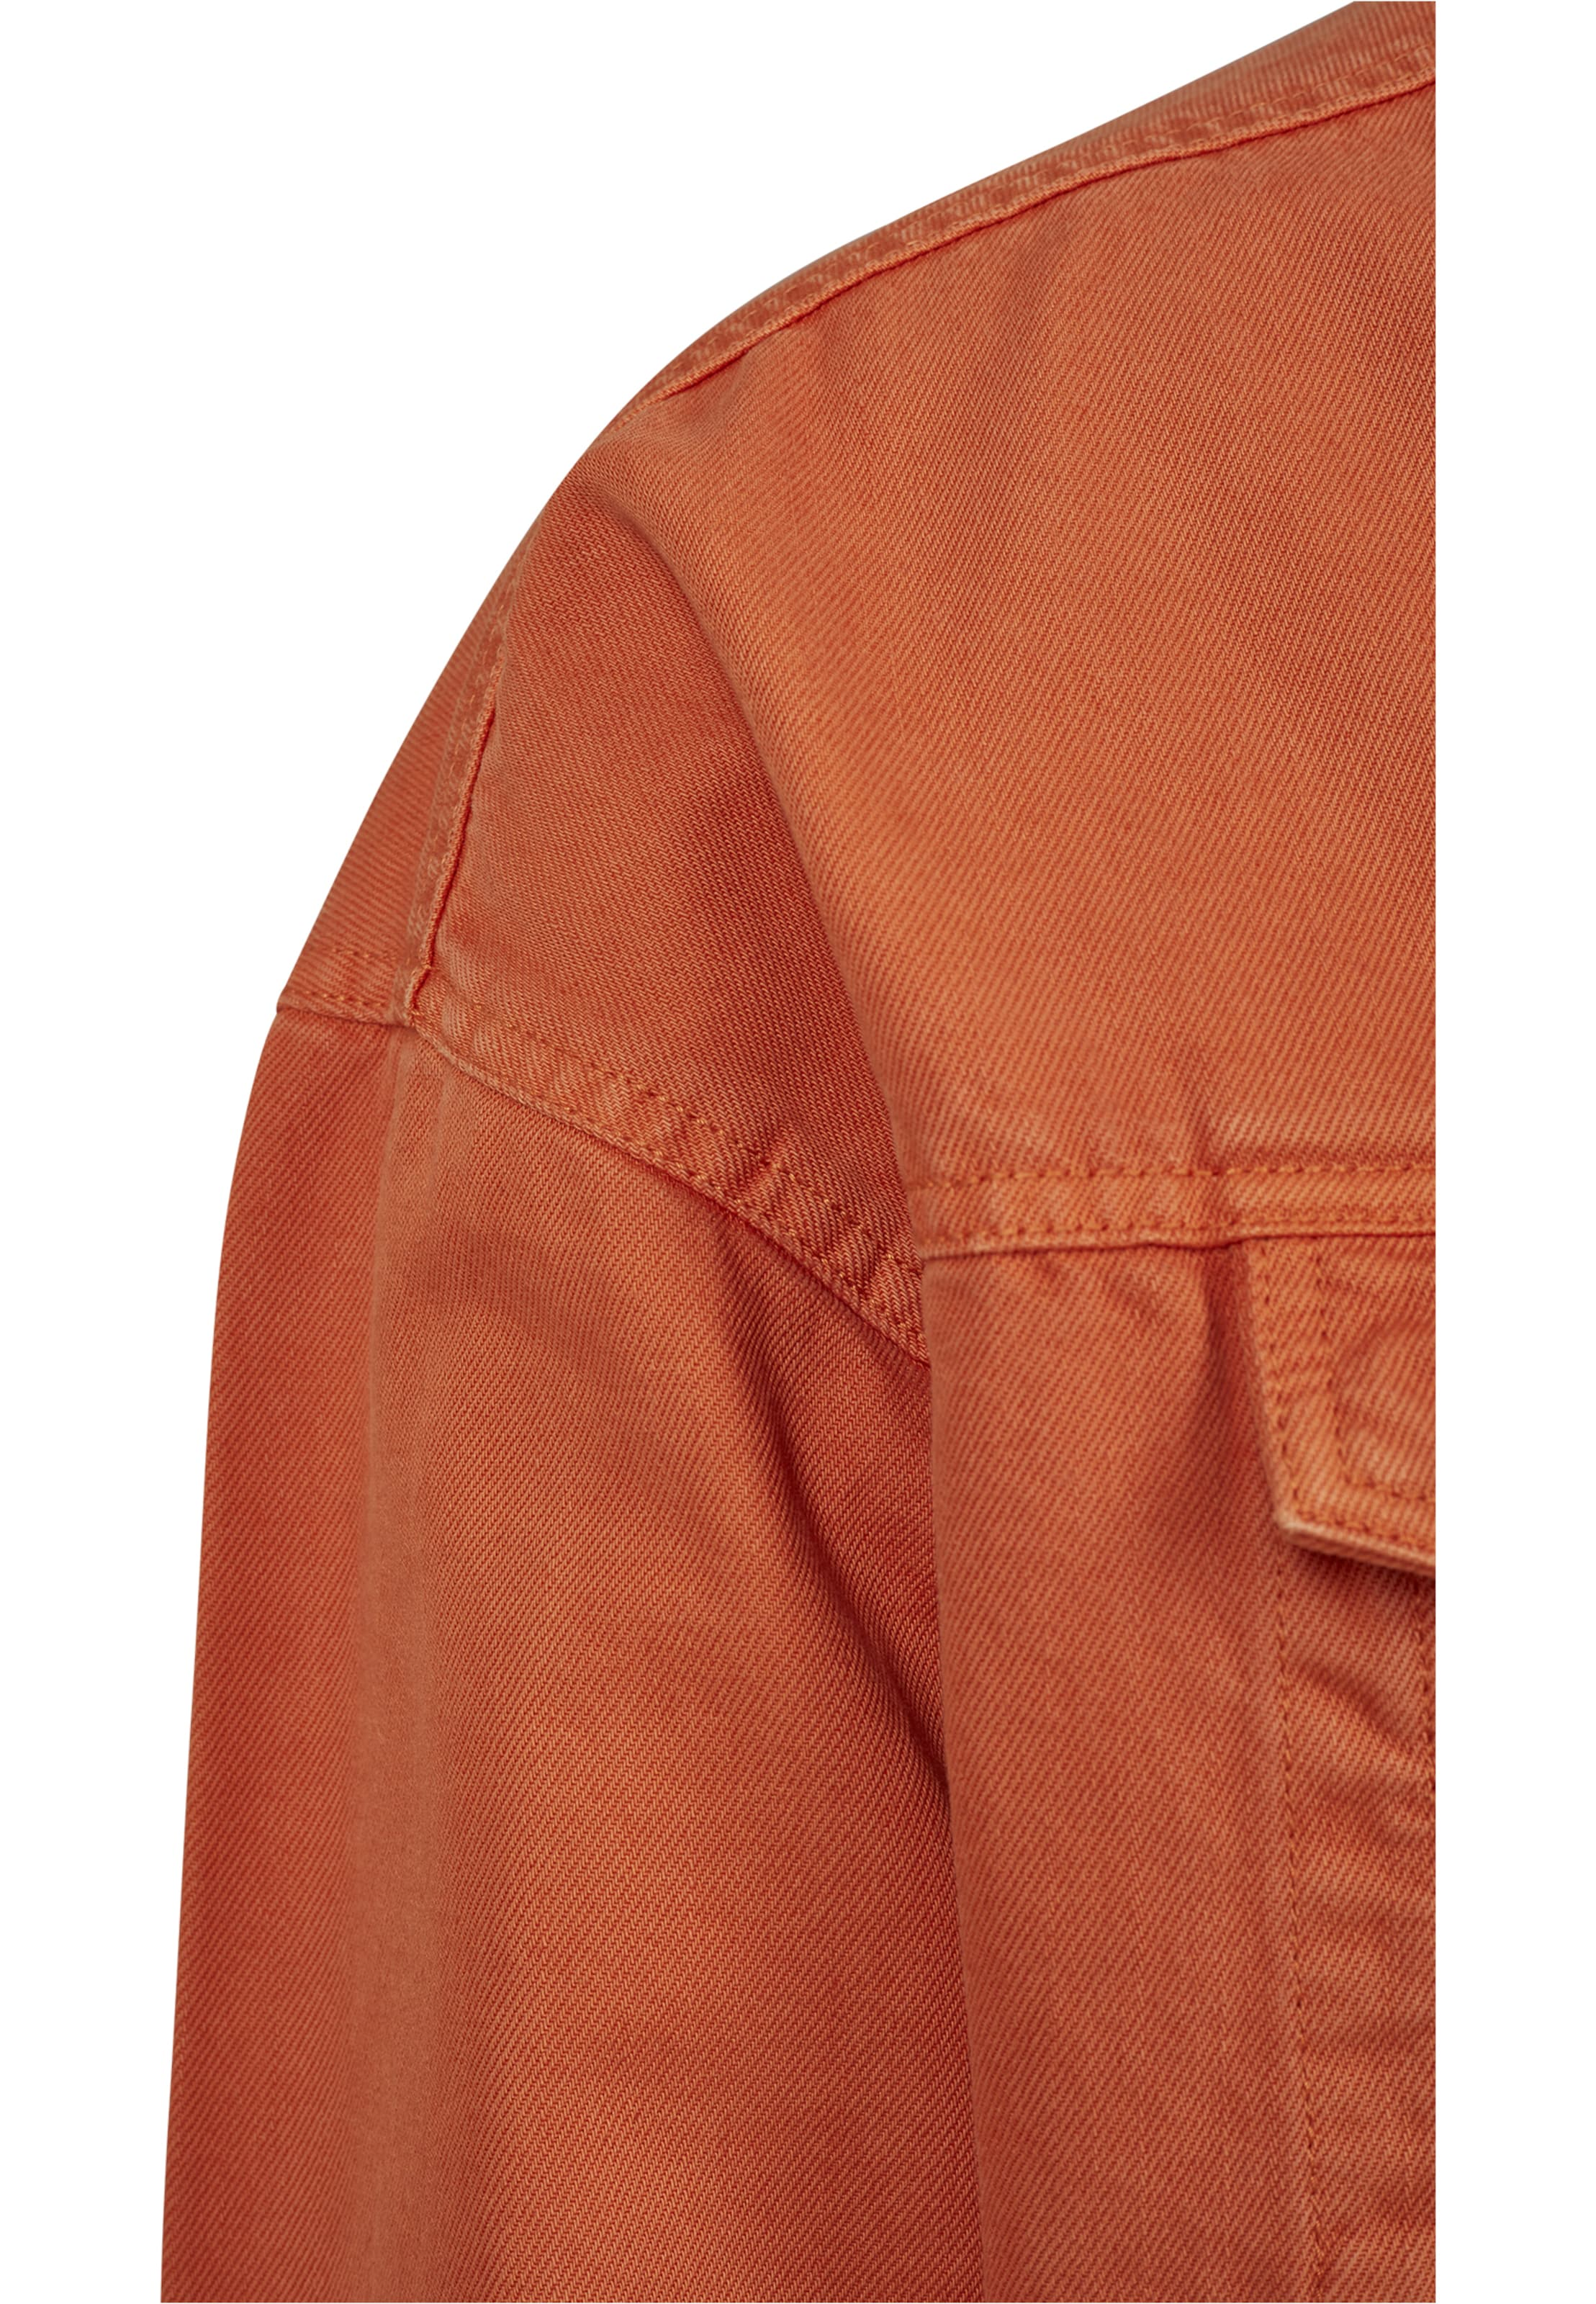 Dunkelorange In Light Classics Jacket Urban ON8kXwPn0